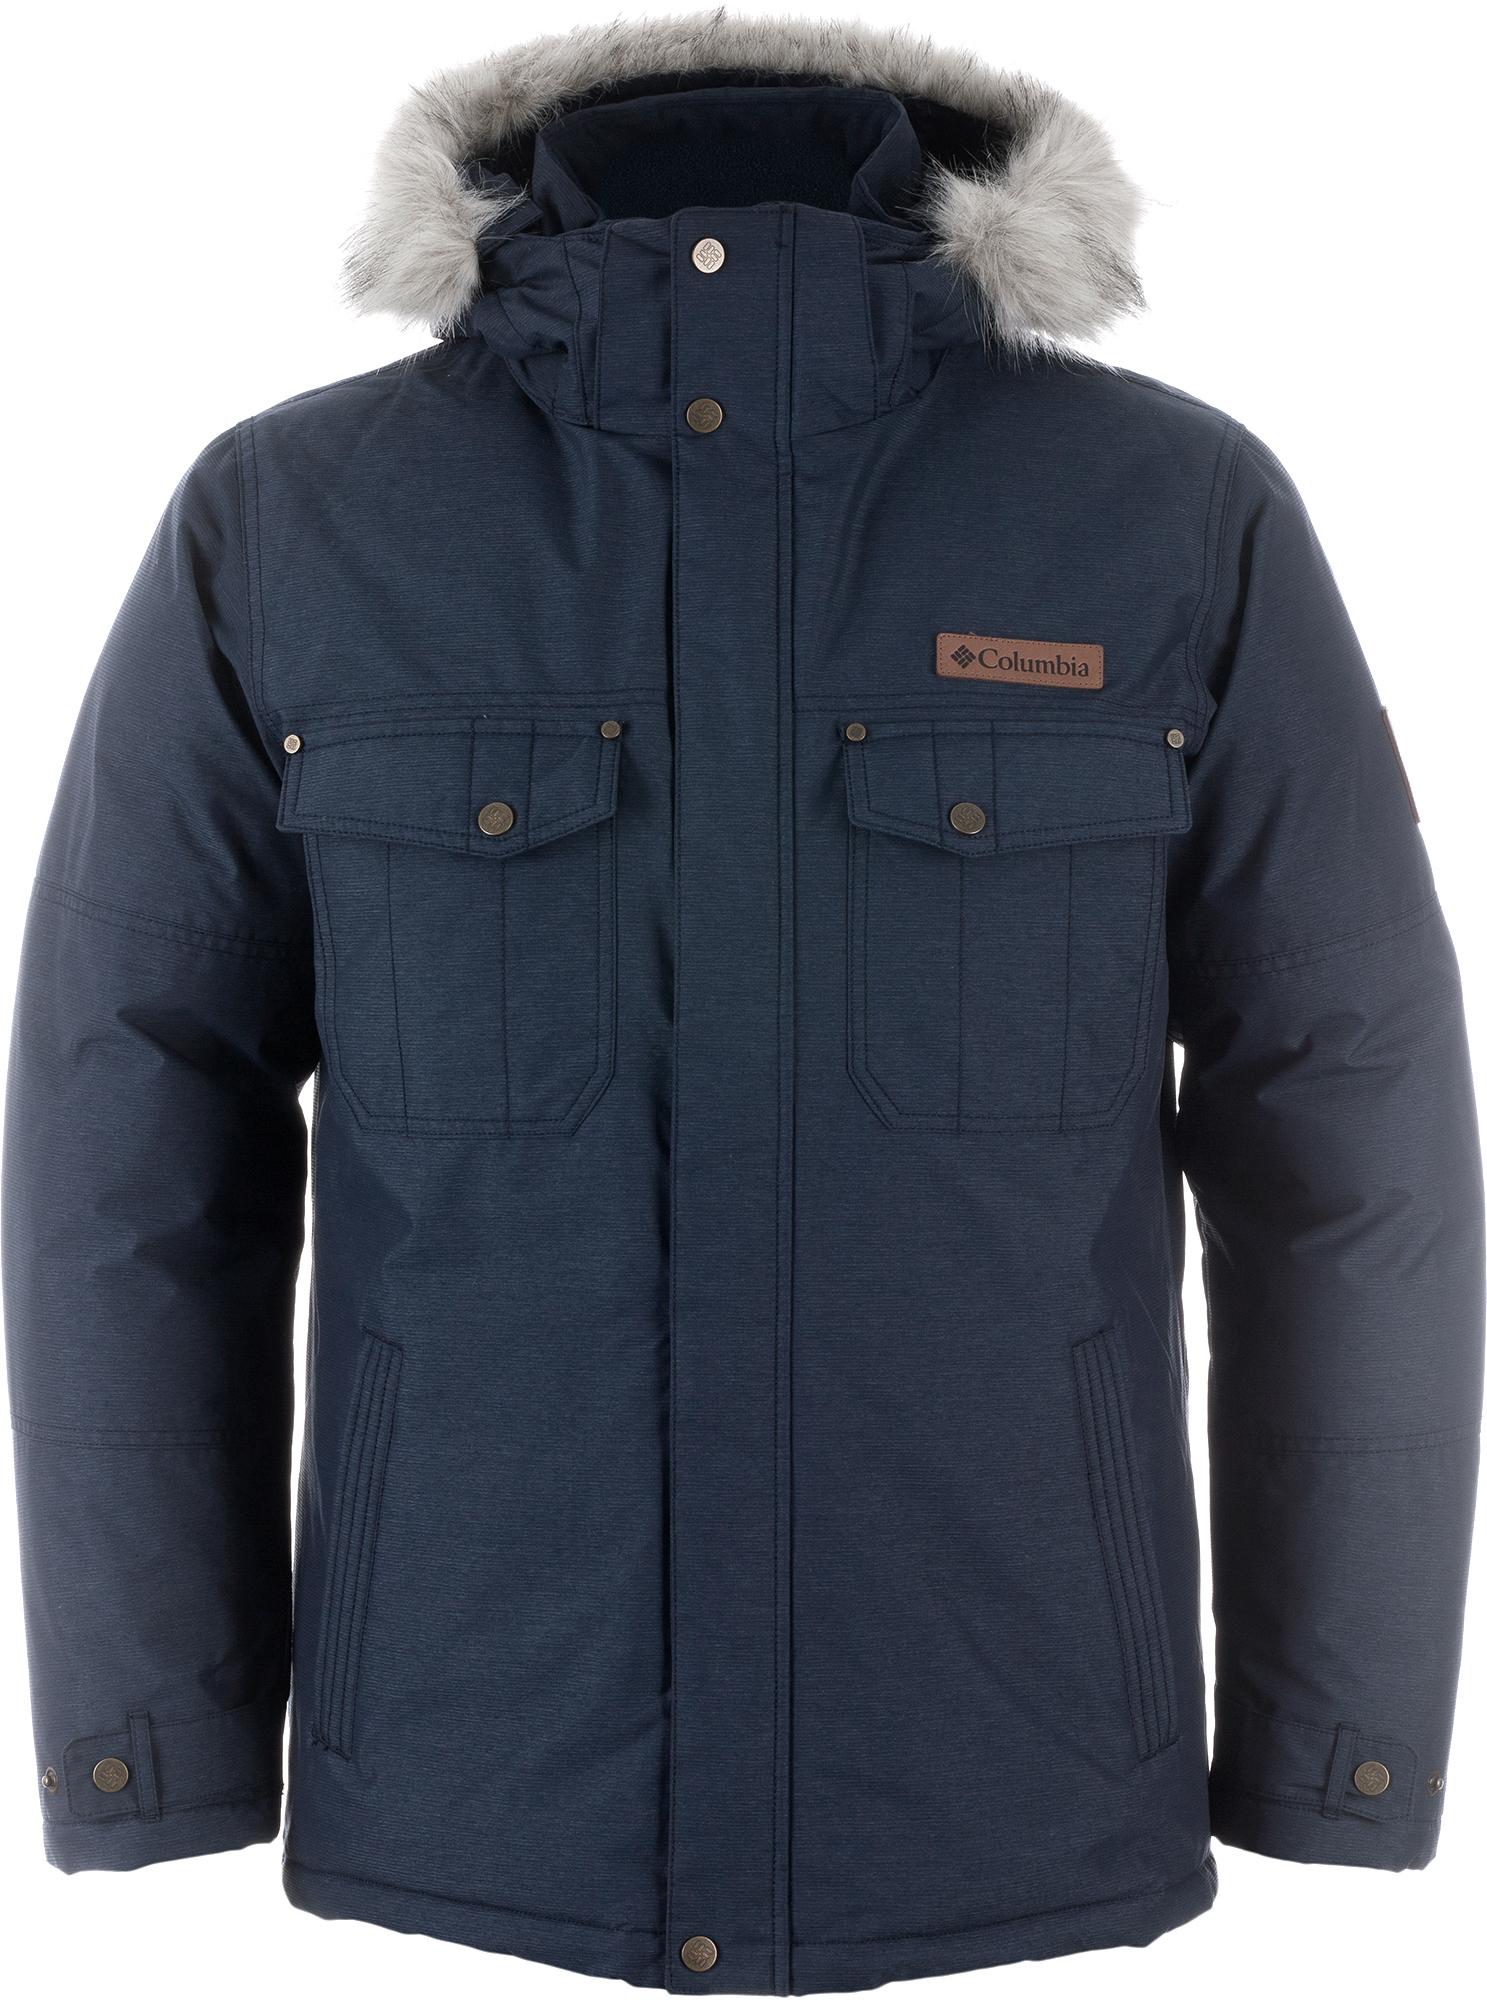 Columbia Куртка утепленная мужская Columbia Morningstar Mountain columbia куртка утепленная мужская columbia maguire place ii